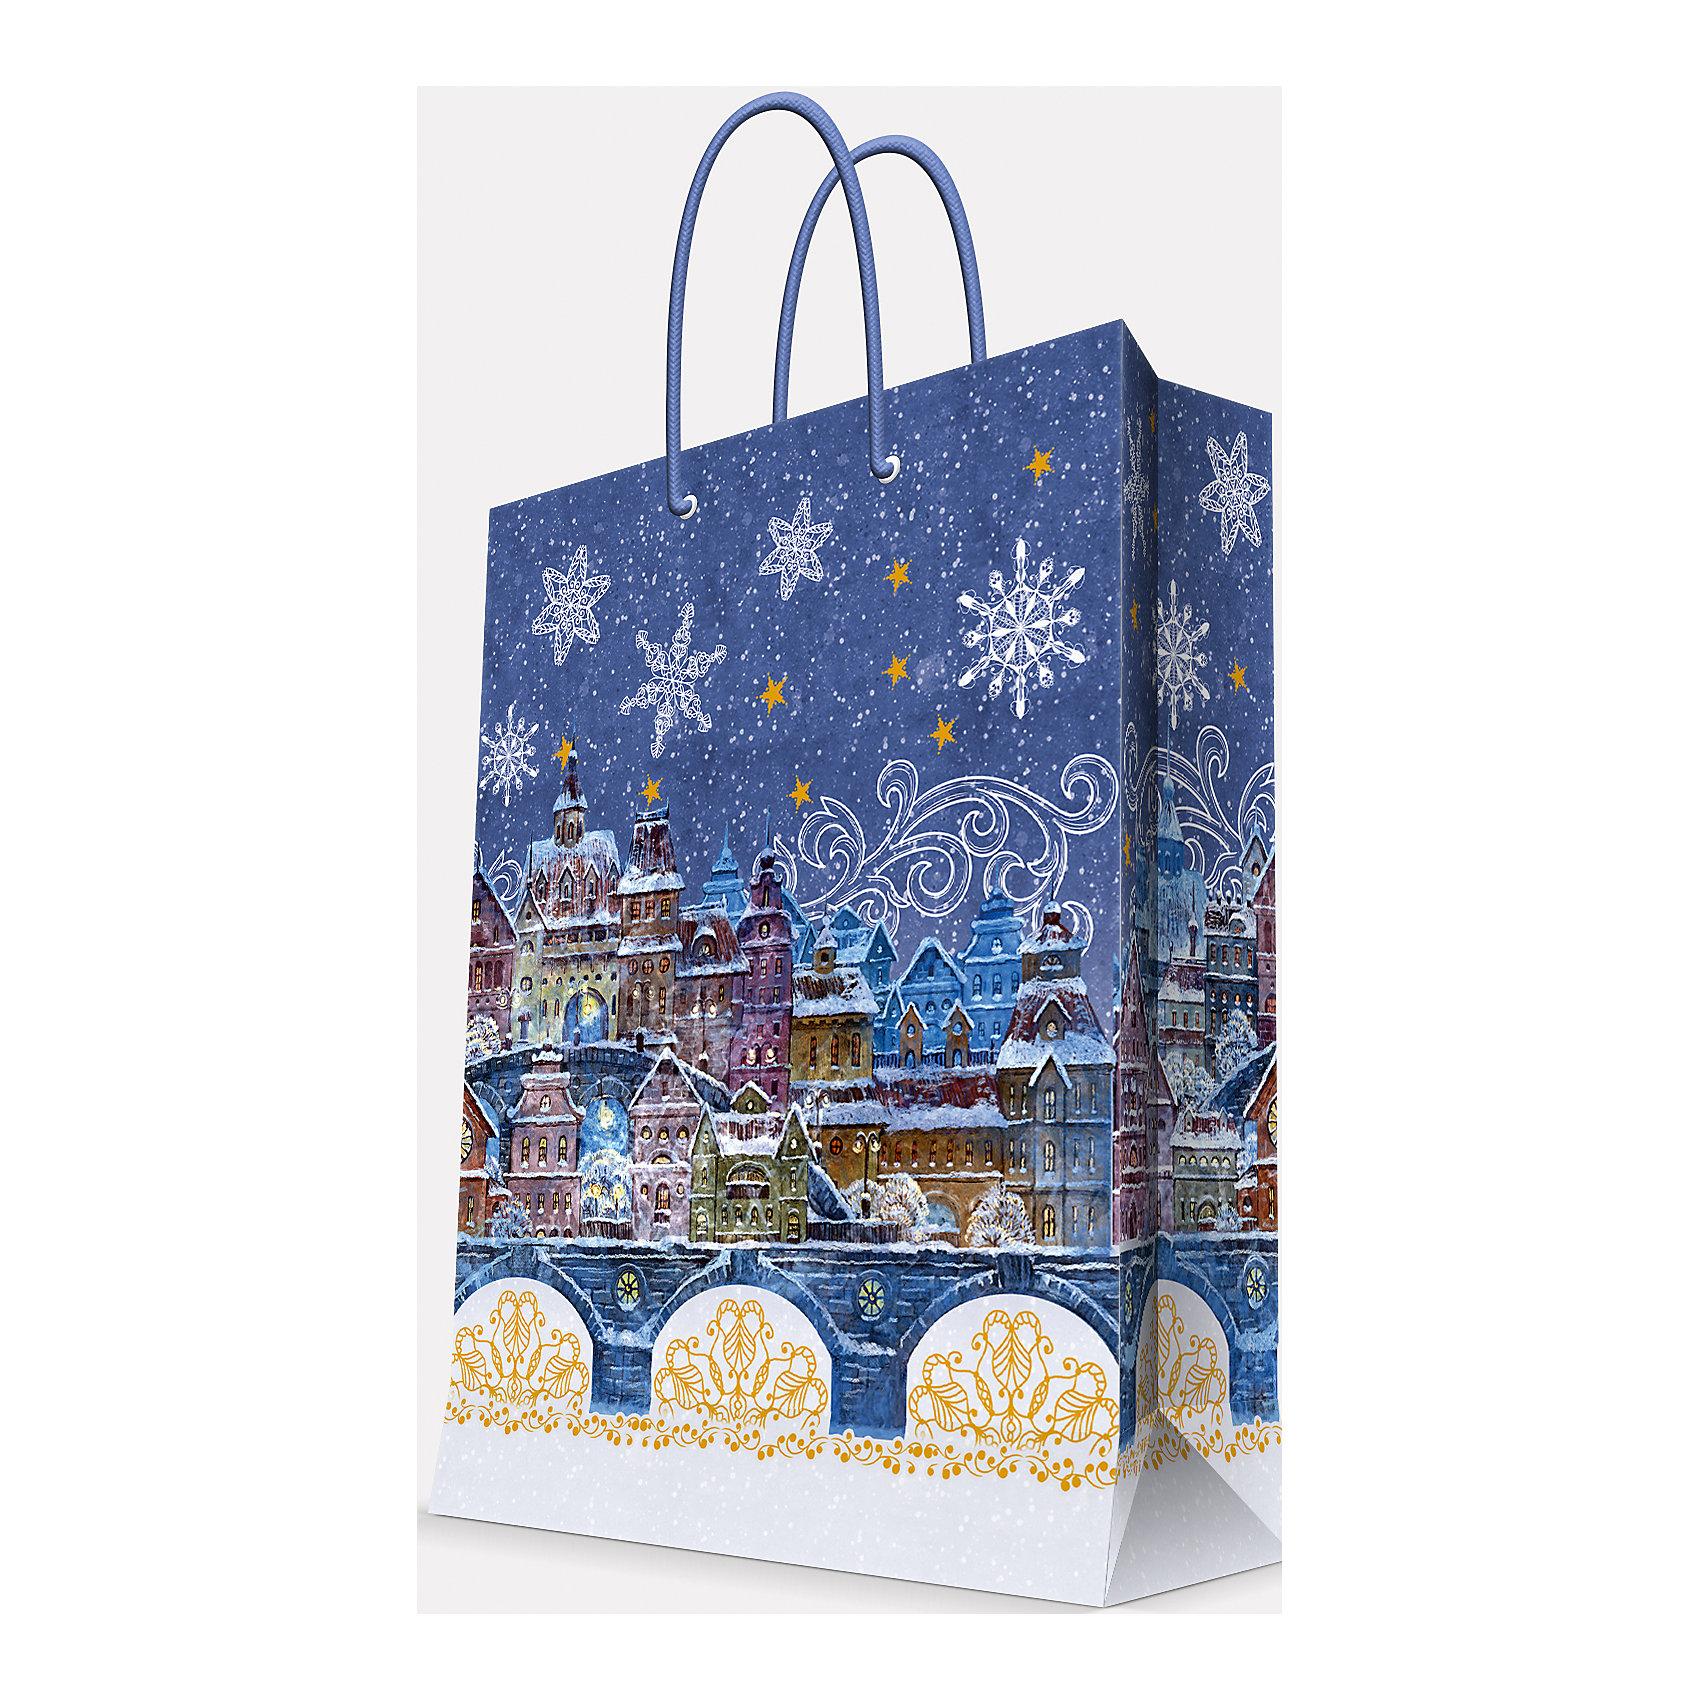 Magic Time Подарочный пакет Сказочный город 40,6*48,9*19 см magic time подарочный пакет новогодняя лампа 26 32 4 12 7 см